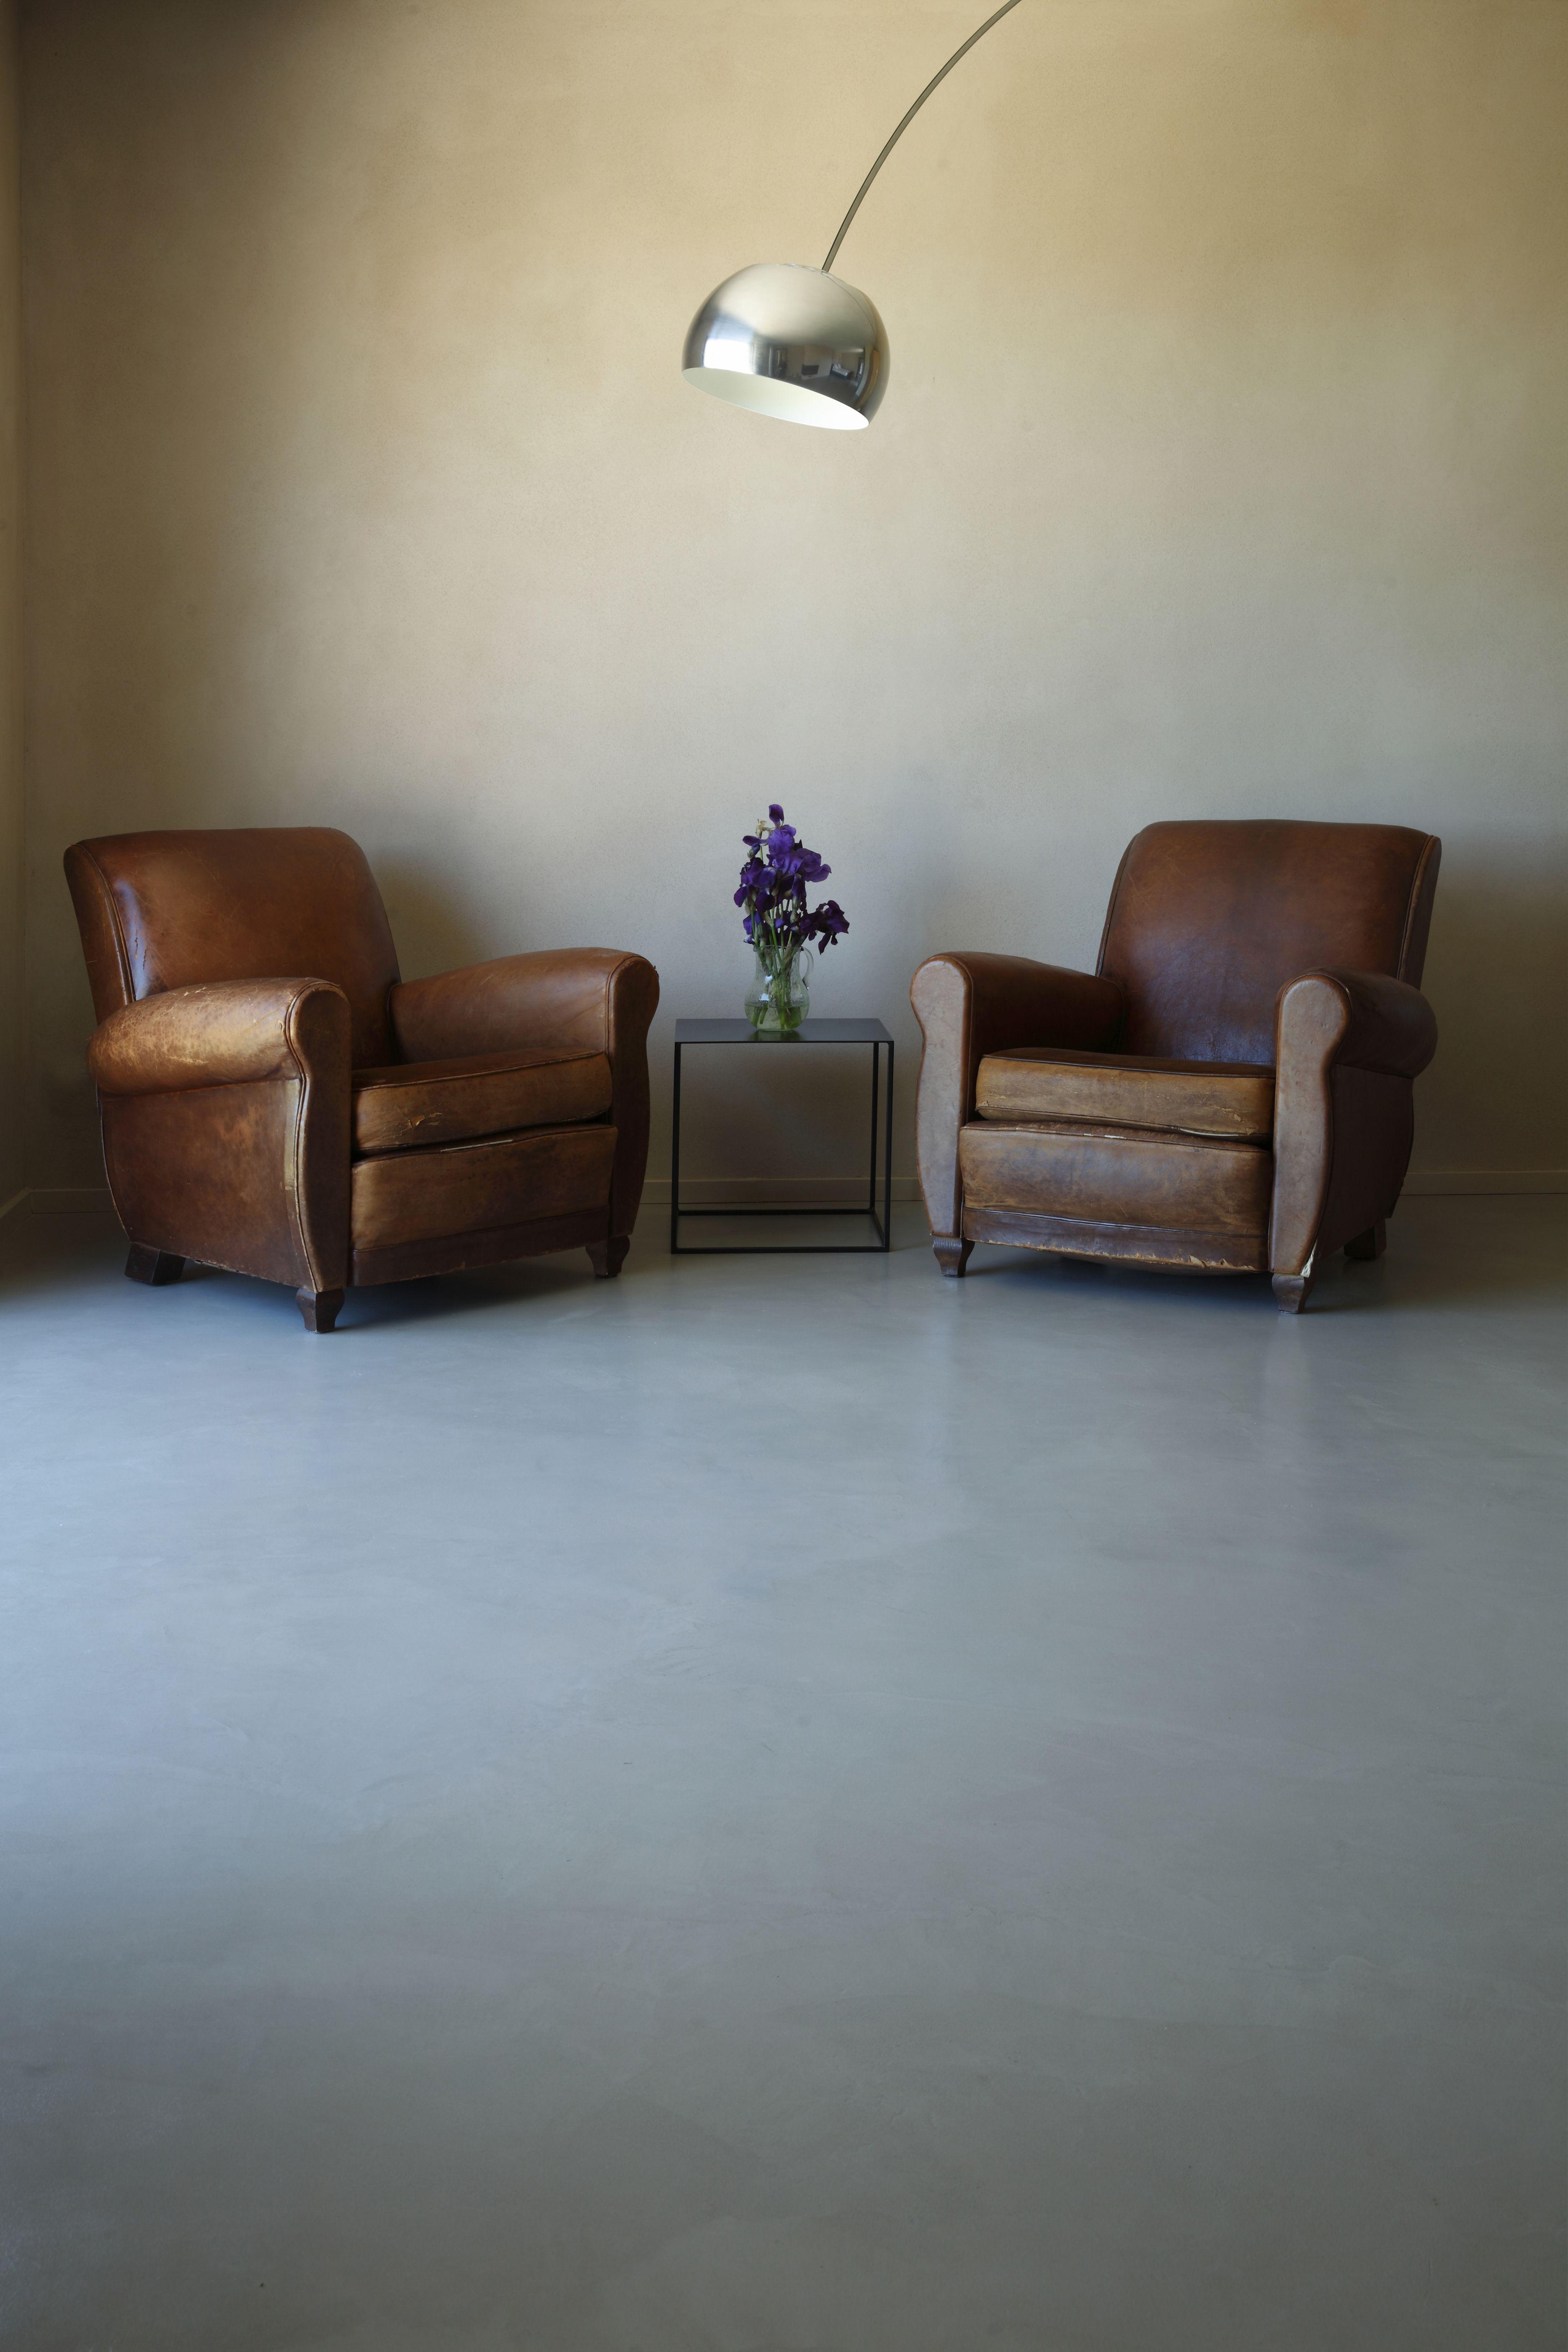 Cire Teintee Pour Canape Cuir Frais Collection Smooth Finish Mortar Wax Concrete Od Francouzské Společnosti